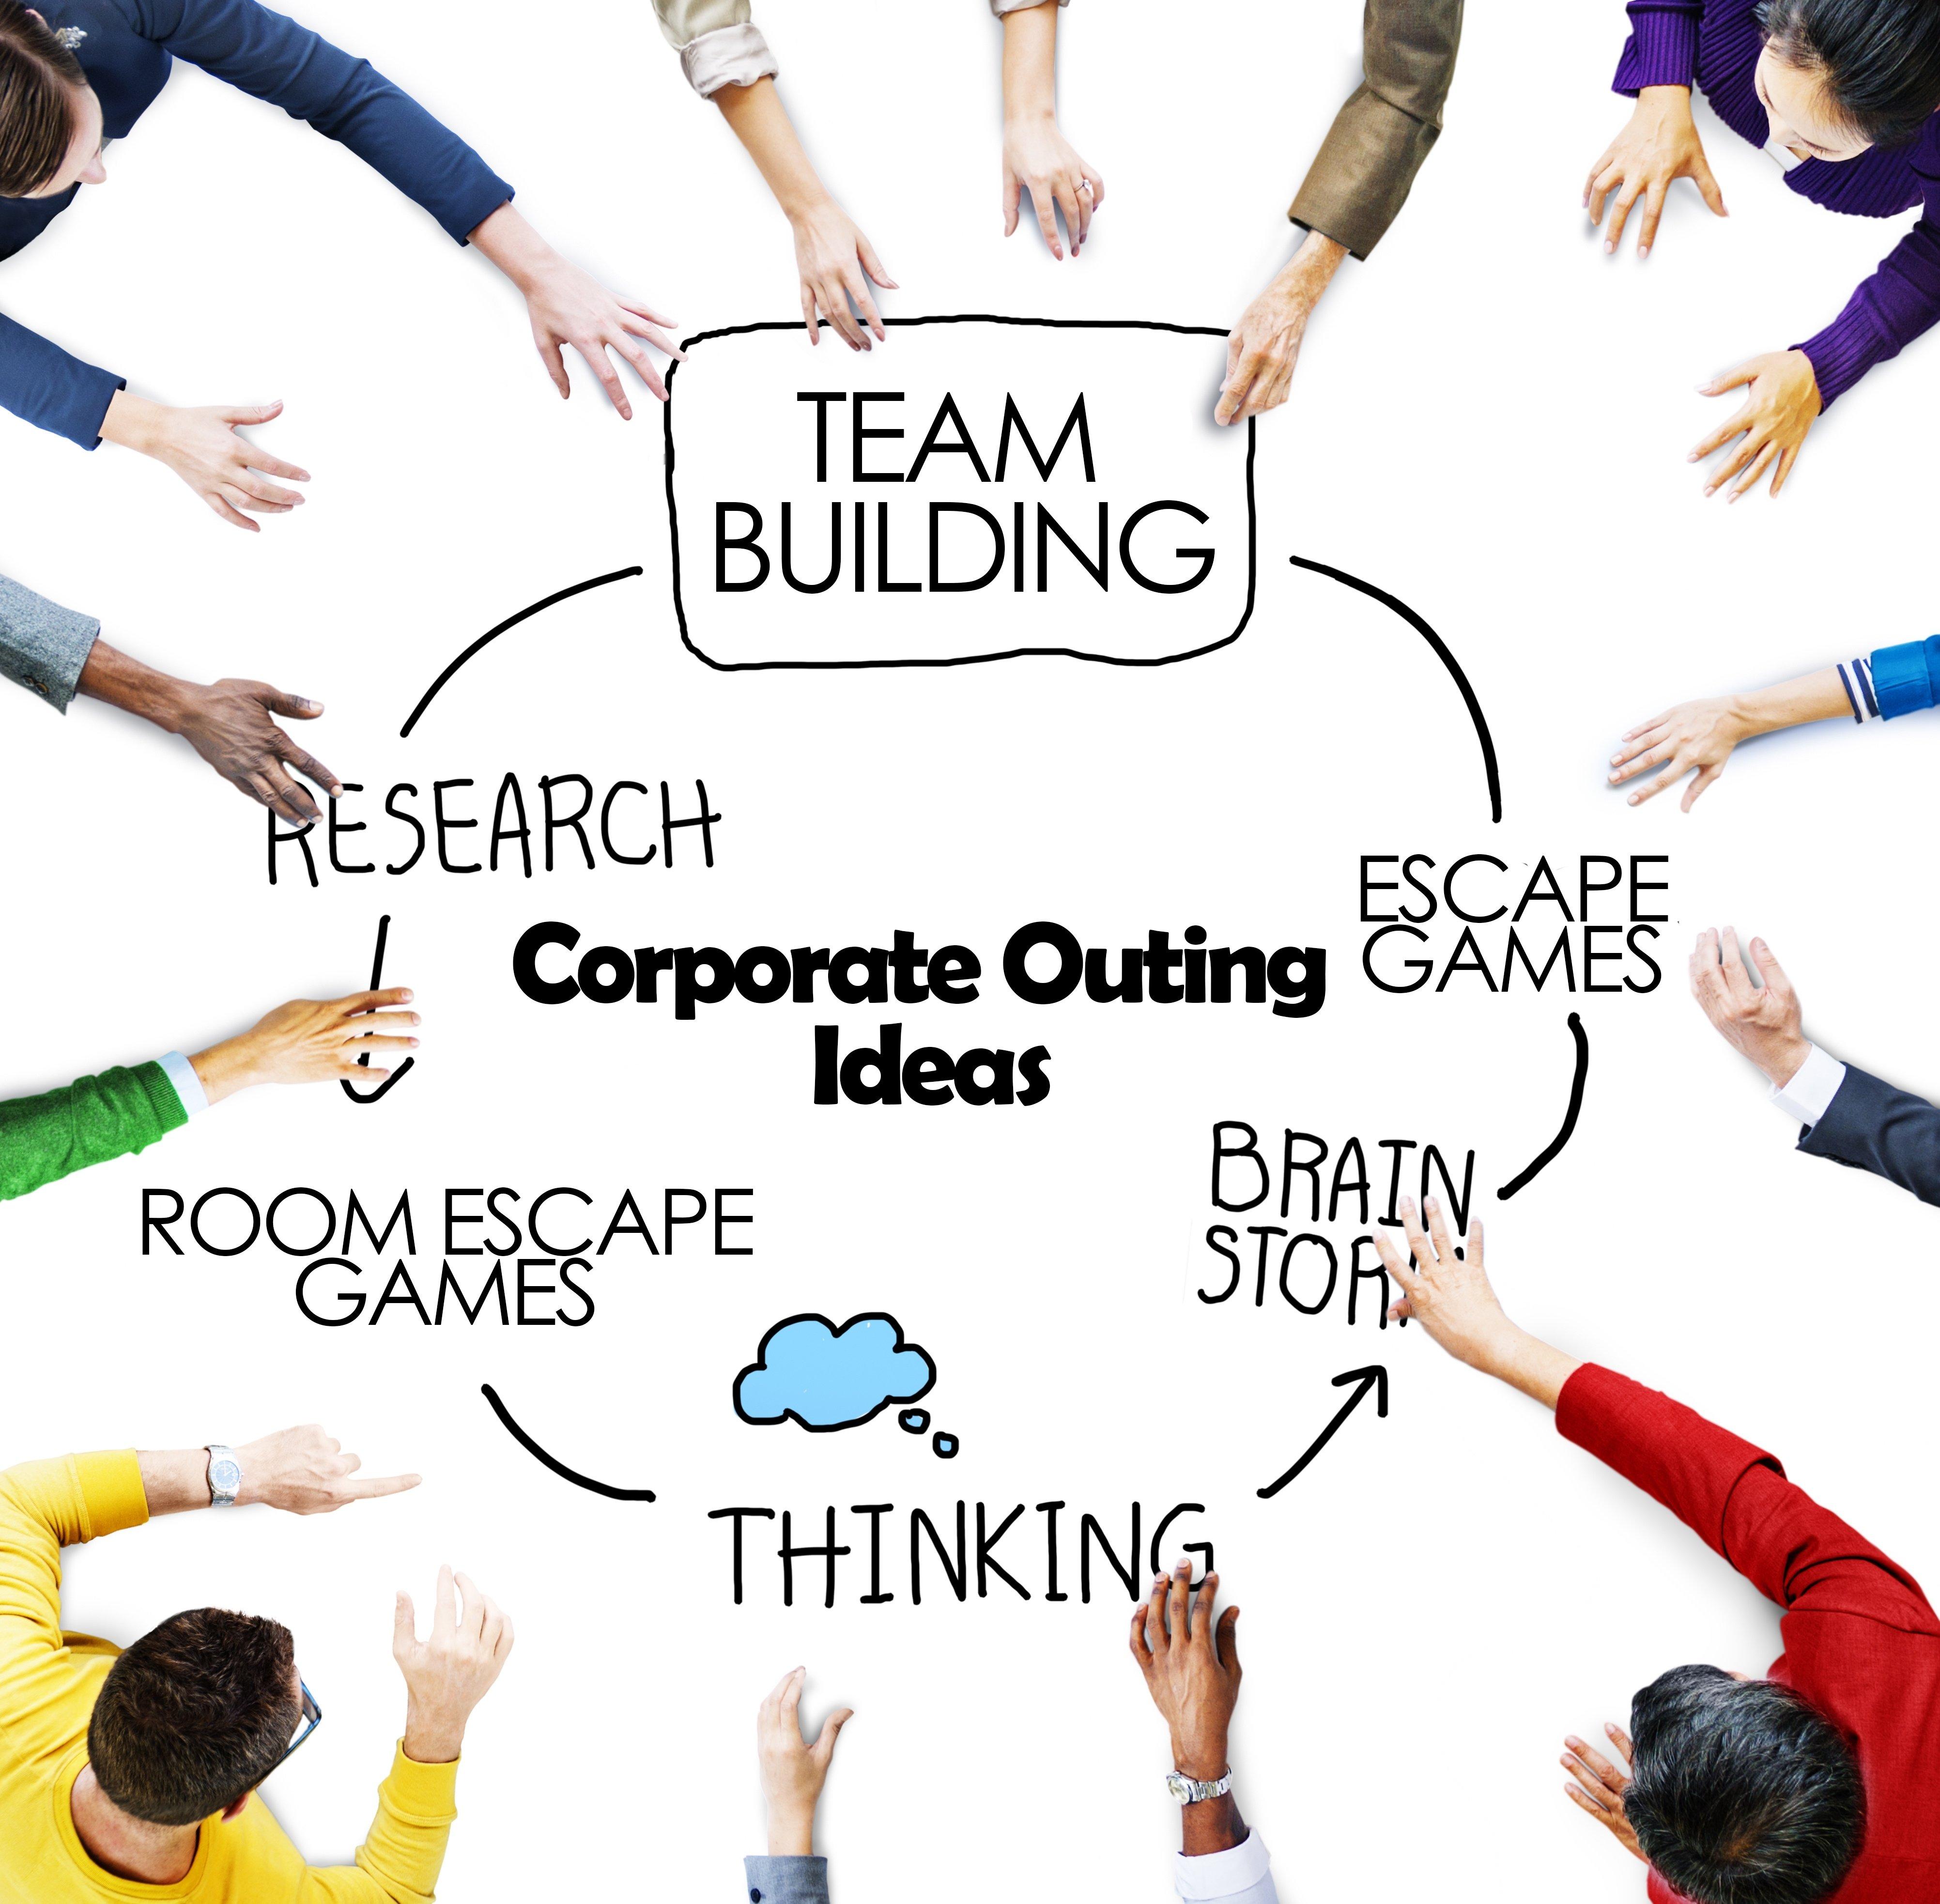 10 Stylish Corporate Team Building Activities Ideas team building activities and fun corporate outing ideas escapegames